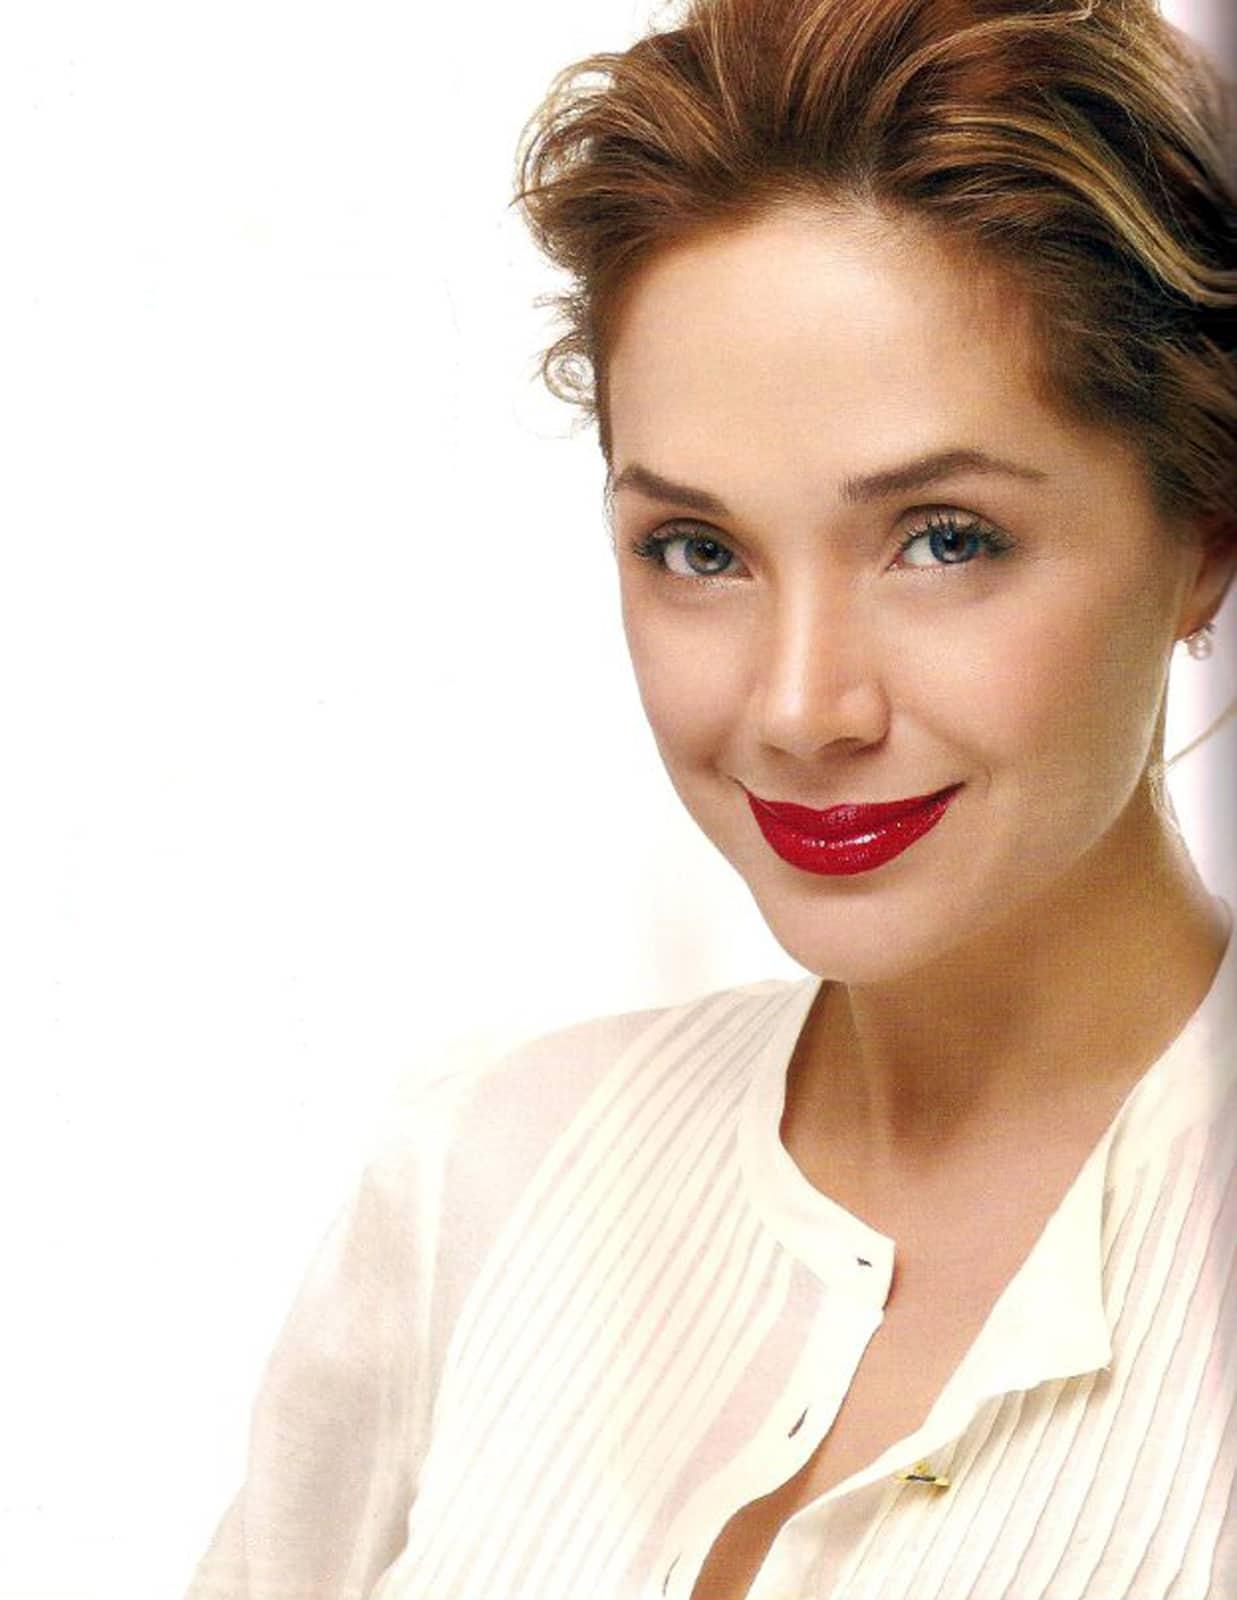 Didem Erol American , Australian, Turkish Actress, Model, TV Host